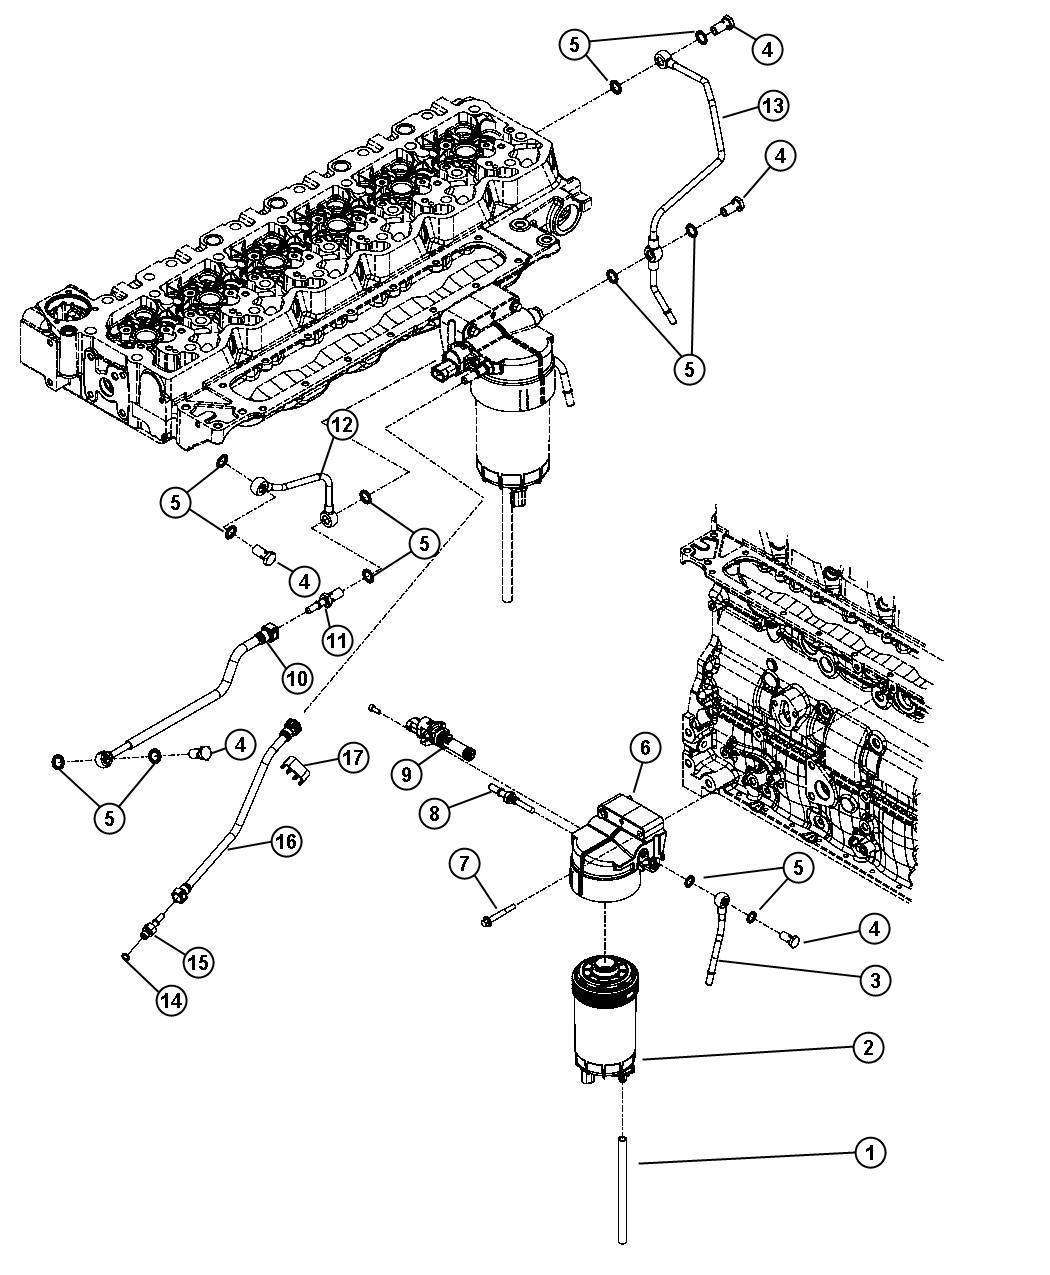 tags: #dodge ram 1500 fuel filter location#2001 dodge ram 1500 fuel filter#fuel  filter location 2012 dodge ram 1500#2005 dodge ram fuel filter#97 dodge ram